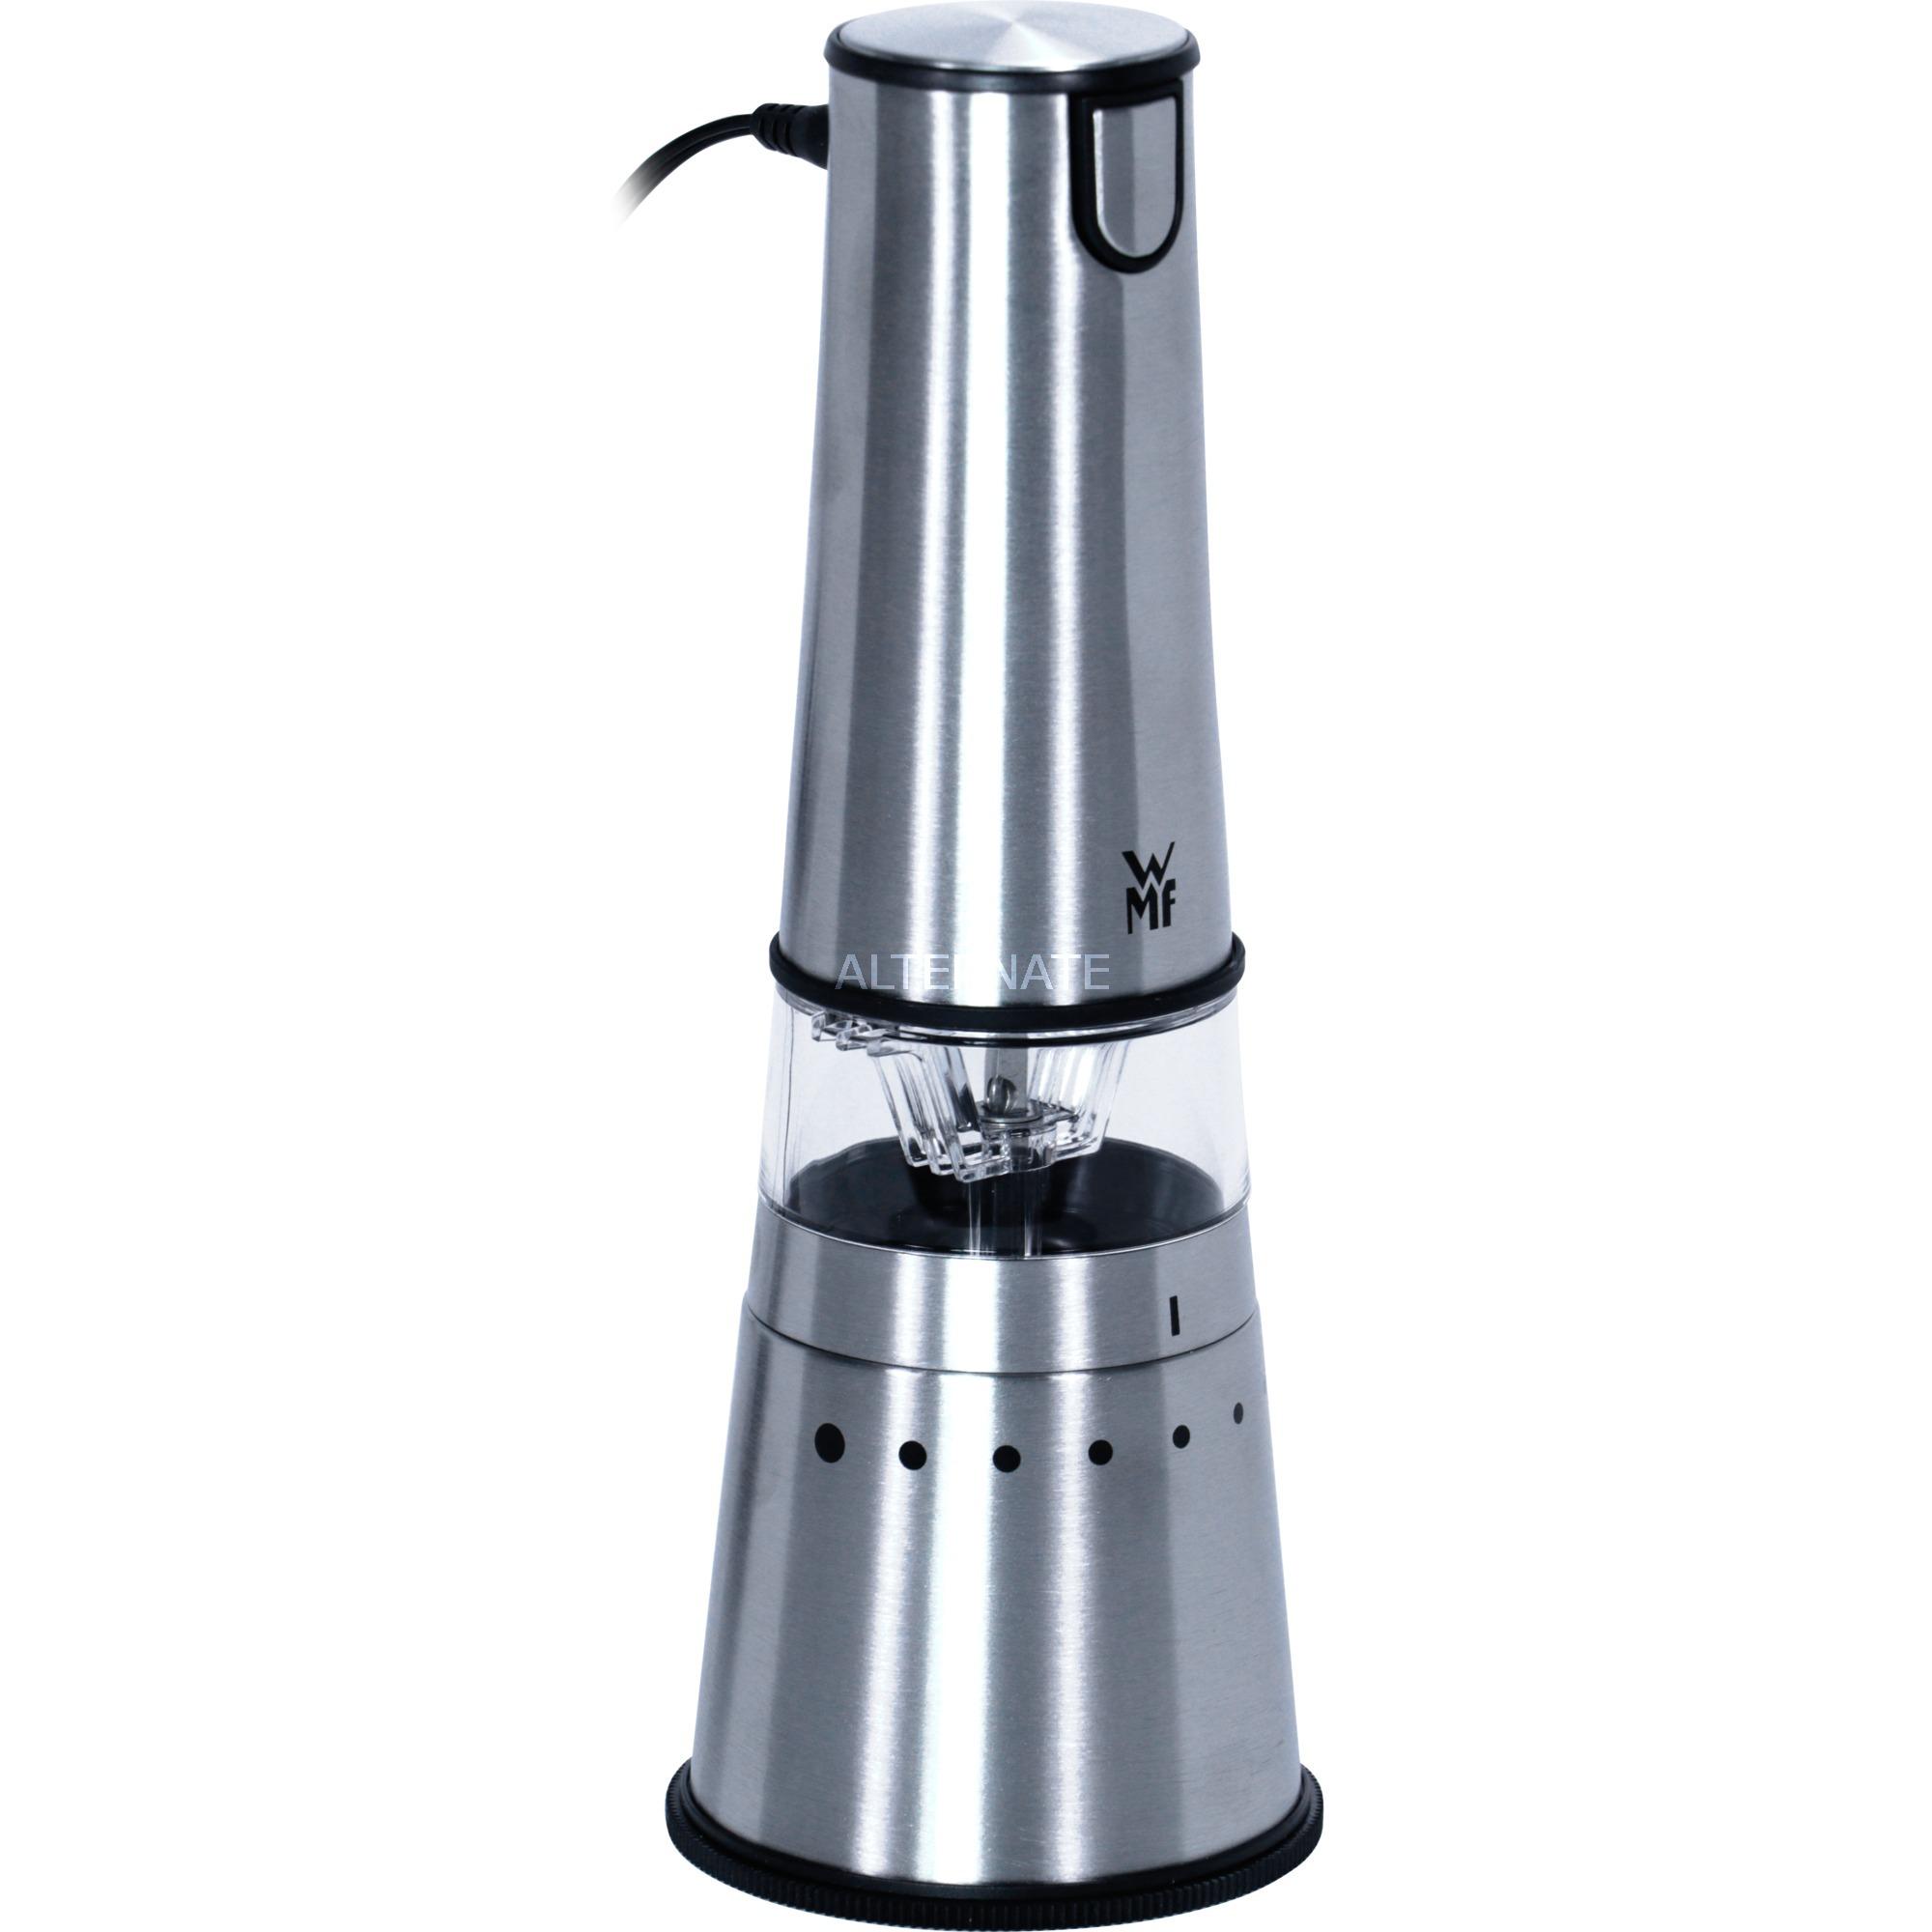 KÜCHENminis Acero inoxidable 24 W, Molinillo de café